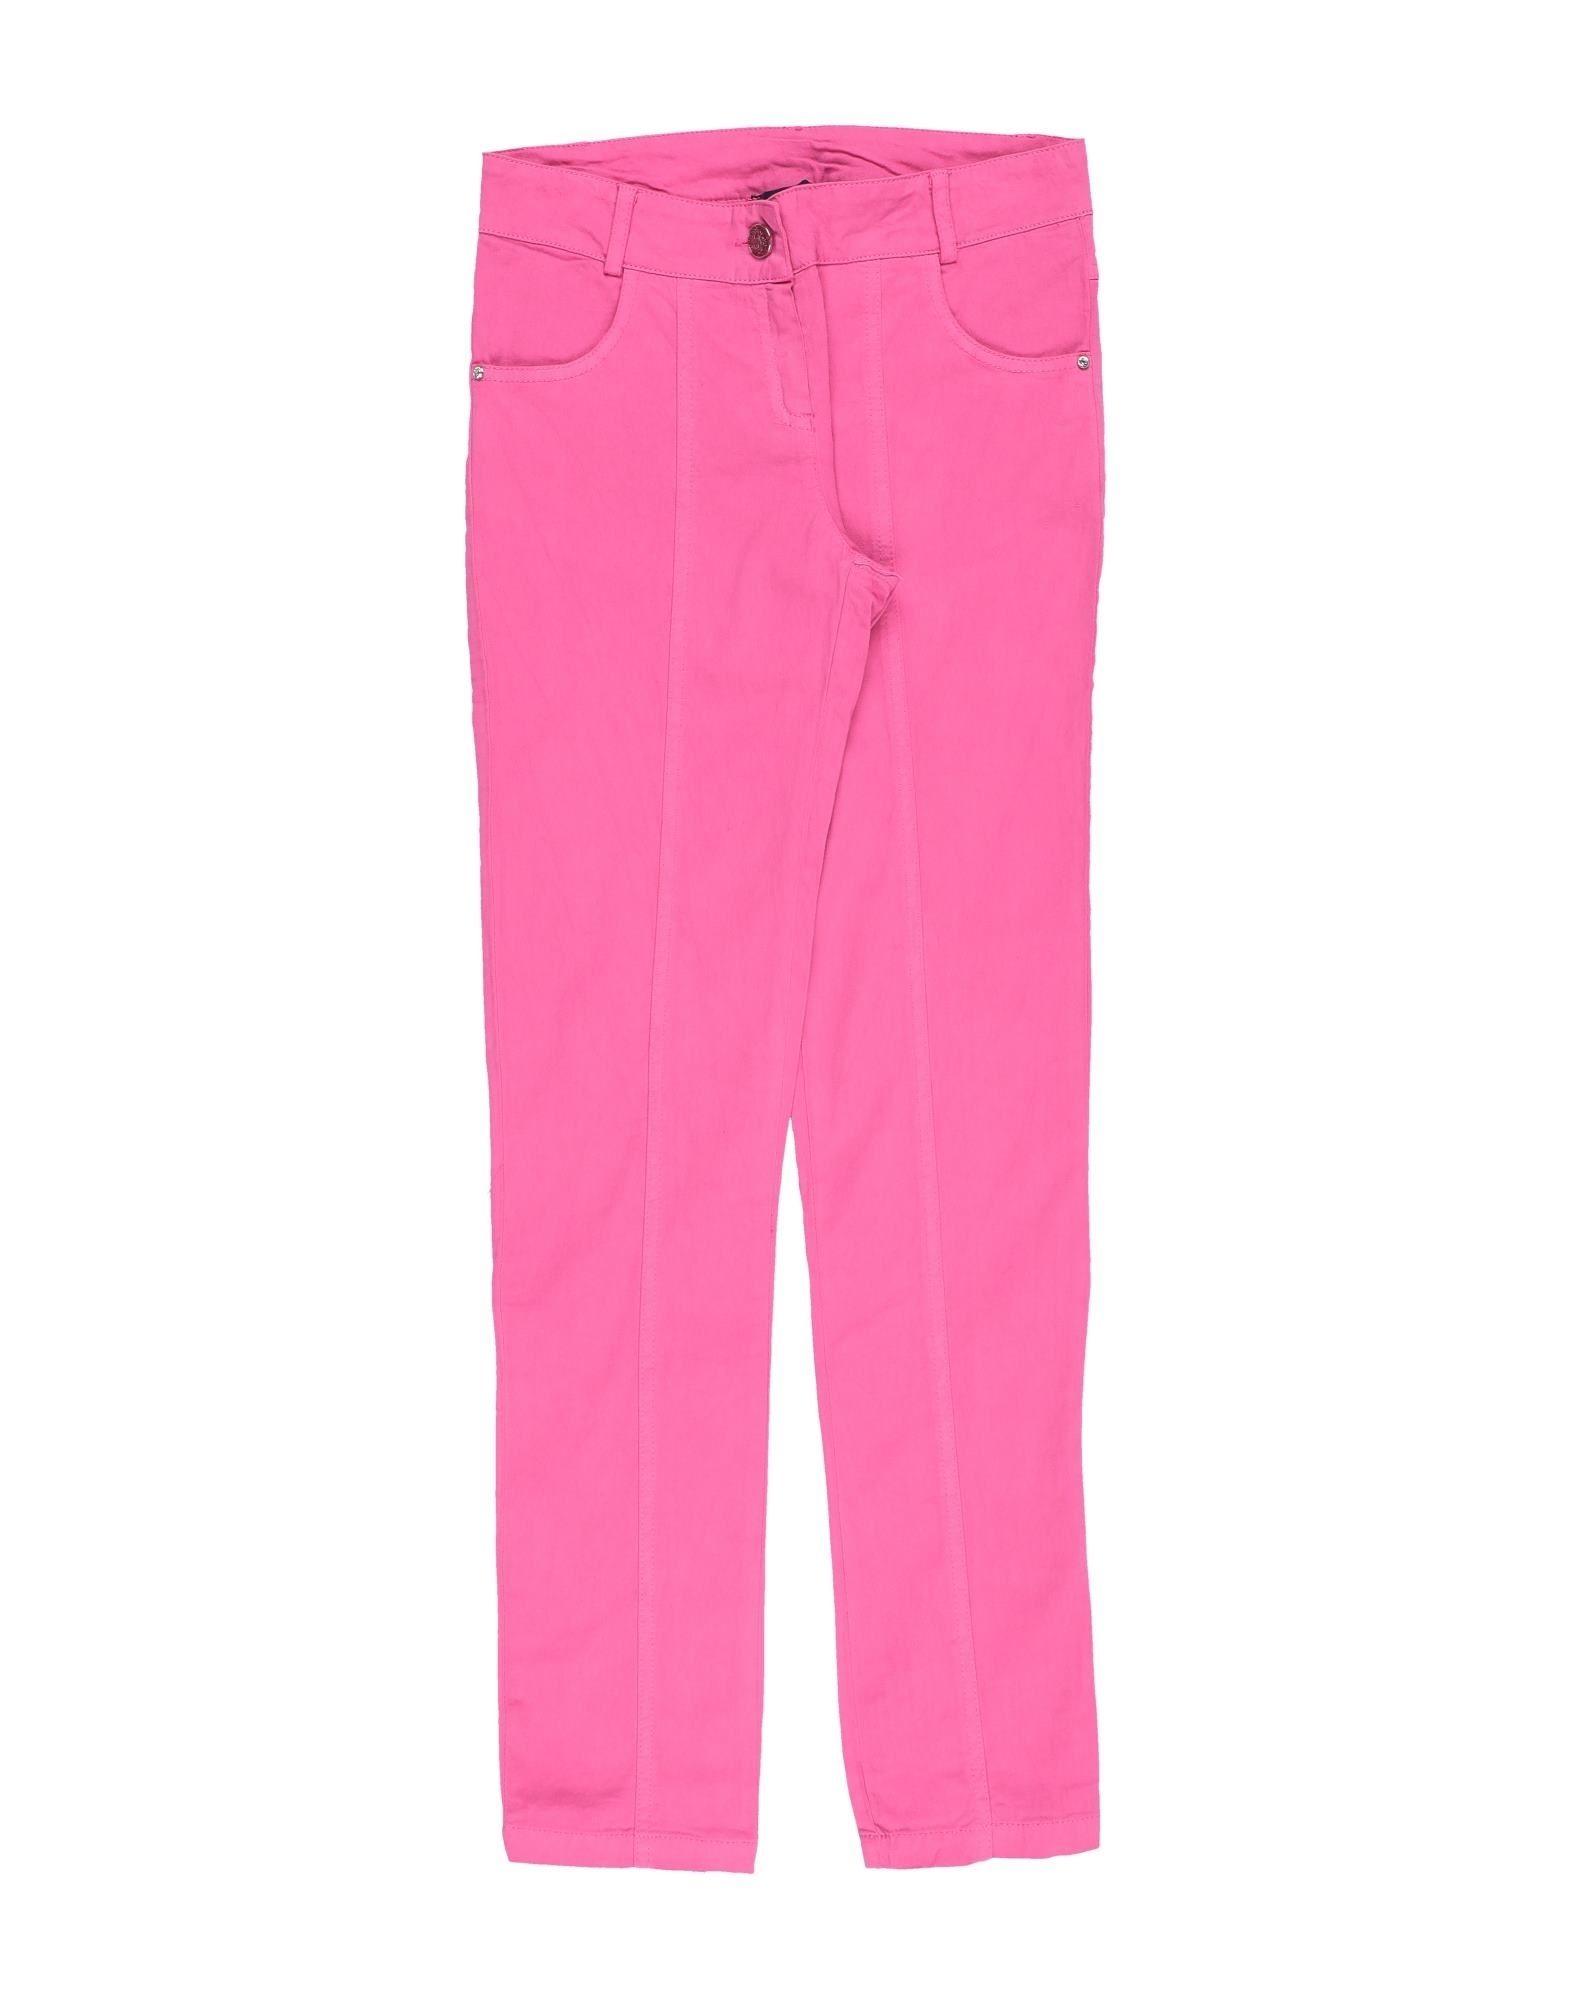 Miss Blumarine Kids' Casual Pants In Purple